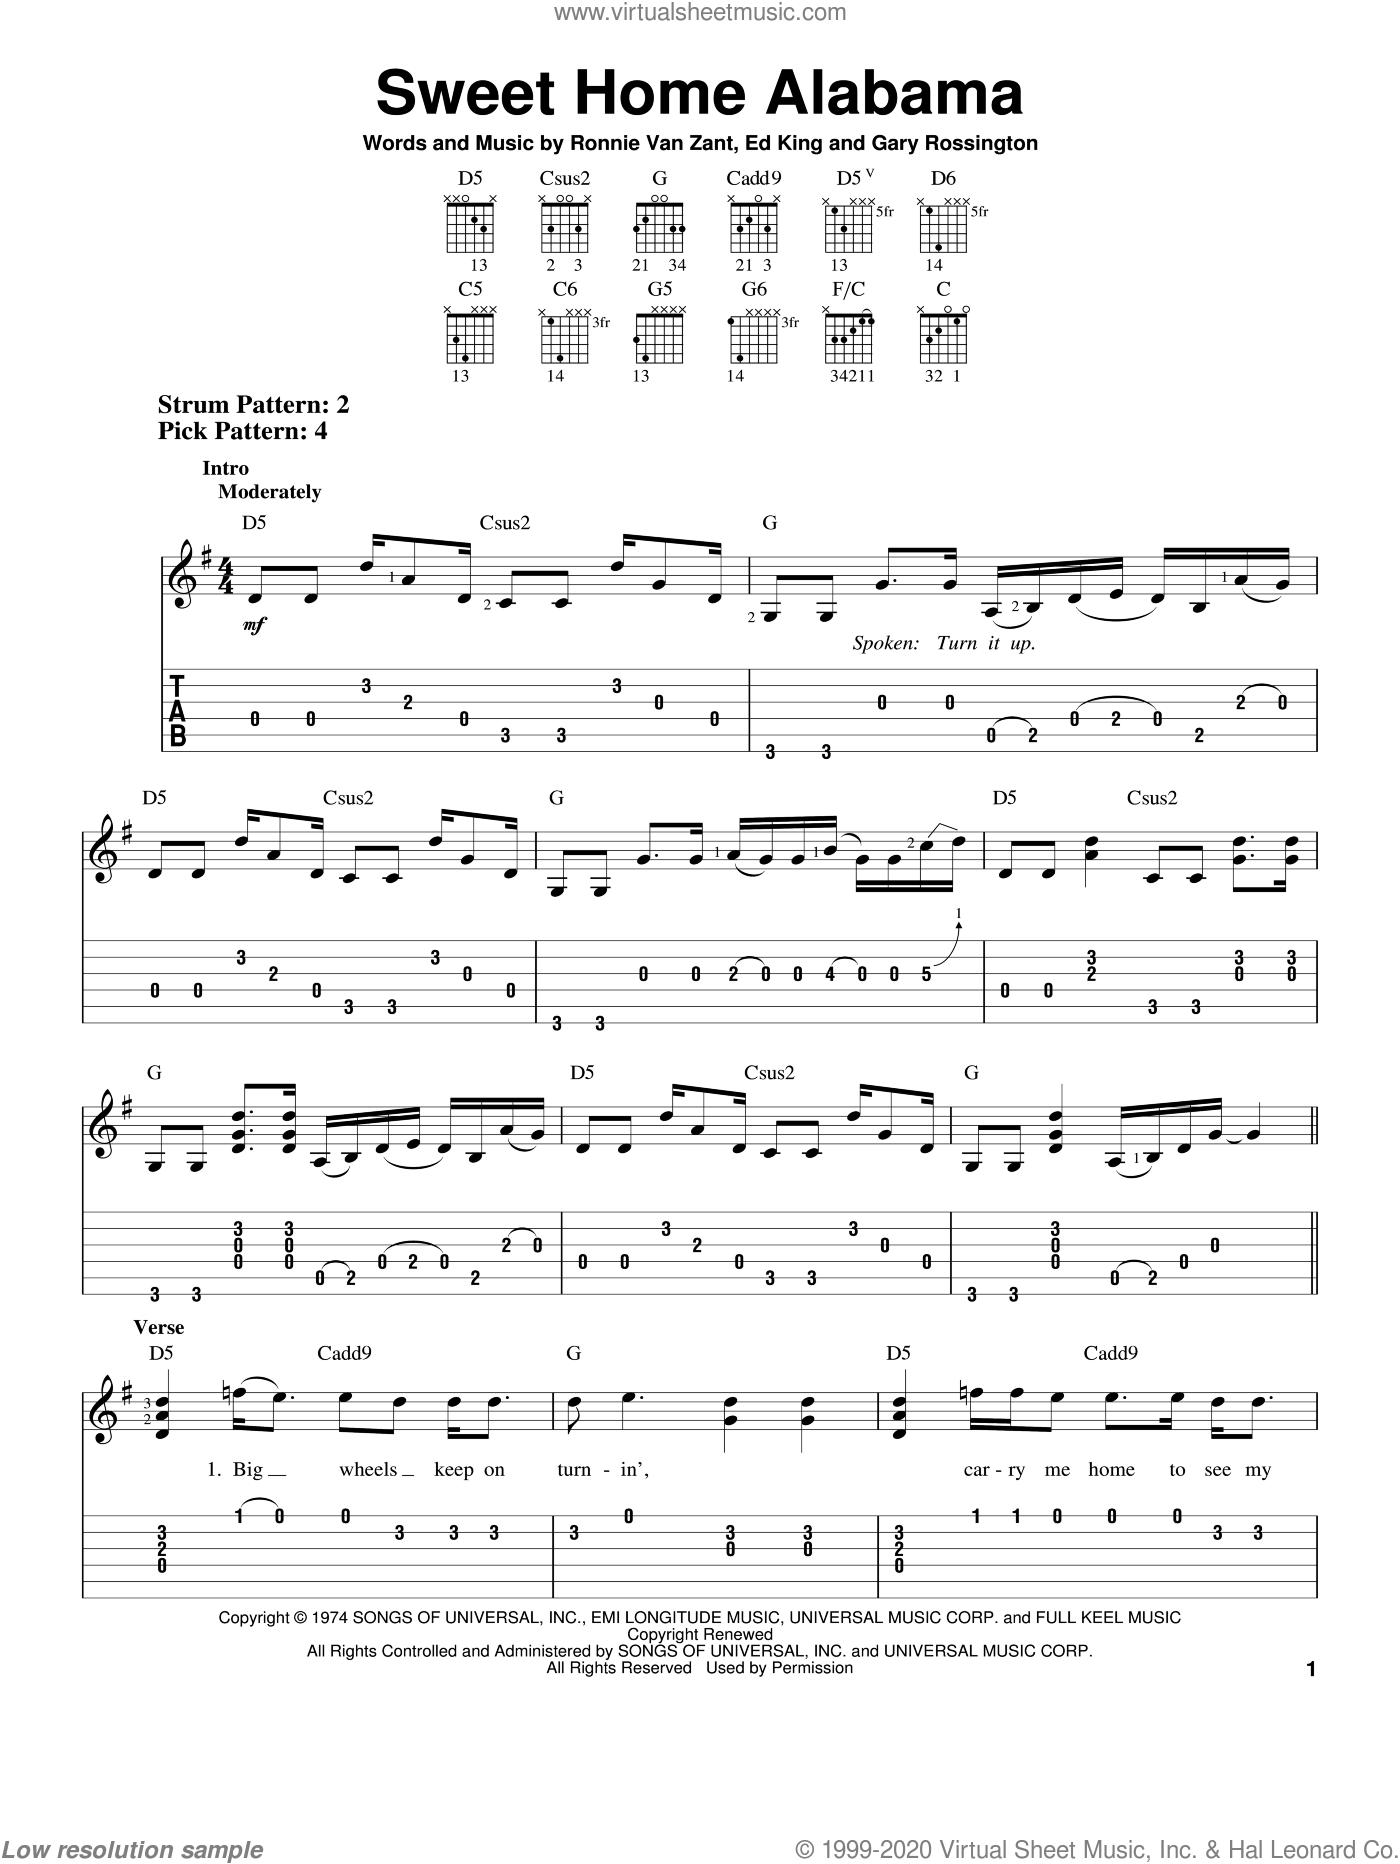 Sweet Home Alabama sheet music for guitar solo (easy tablature) by Lynyrd Skynyrd, Edward King, Gary Rossington and Ronnie Van Zant, easy guitar (easy tablature)